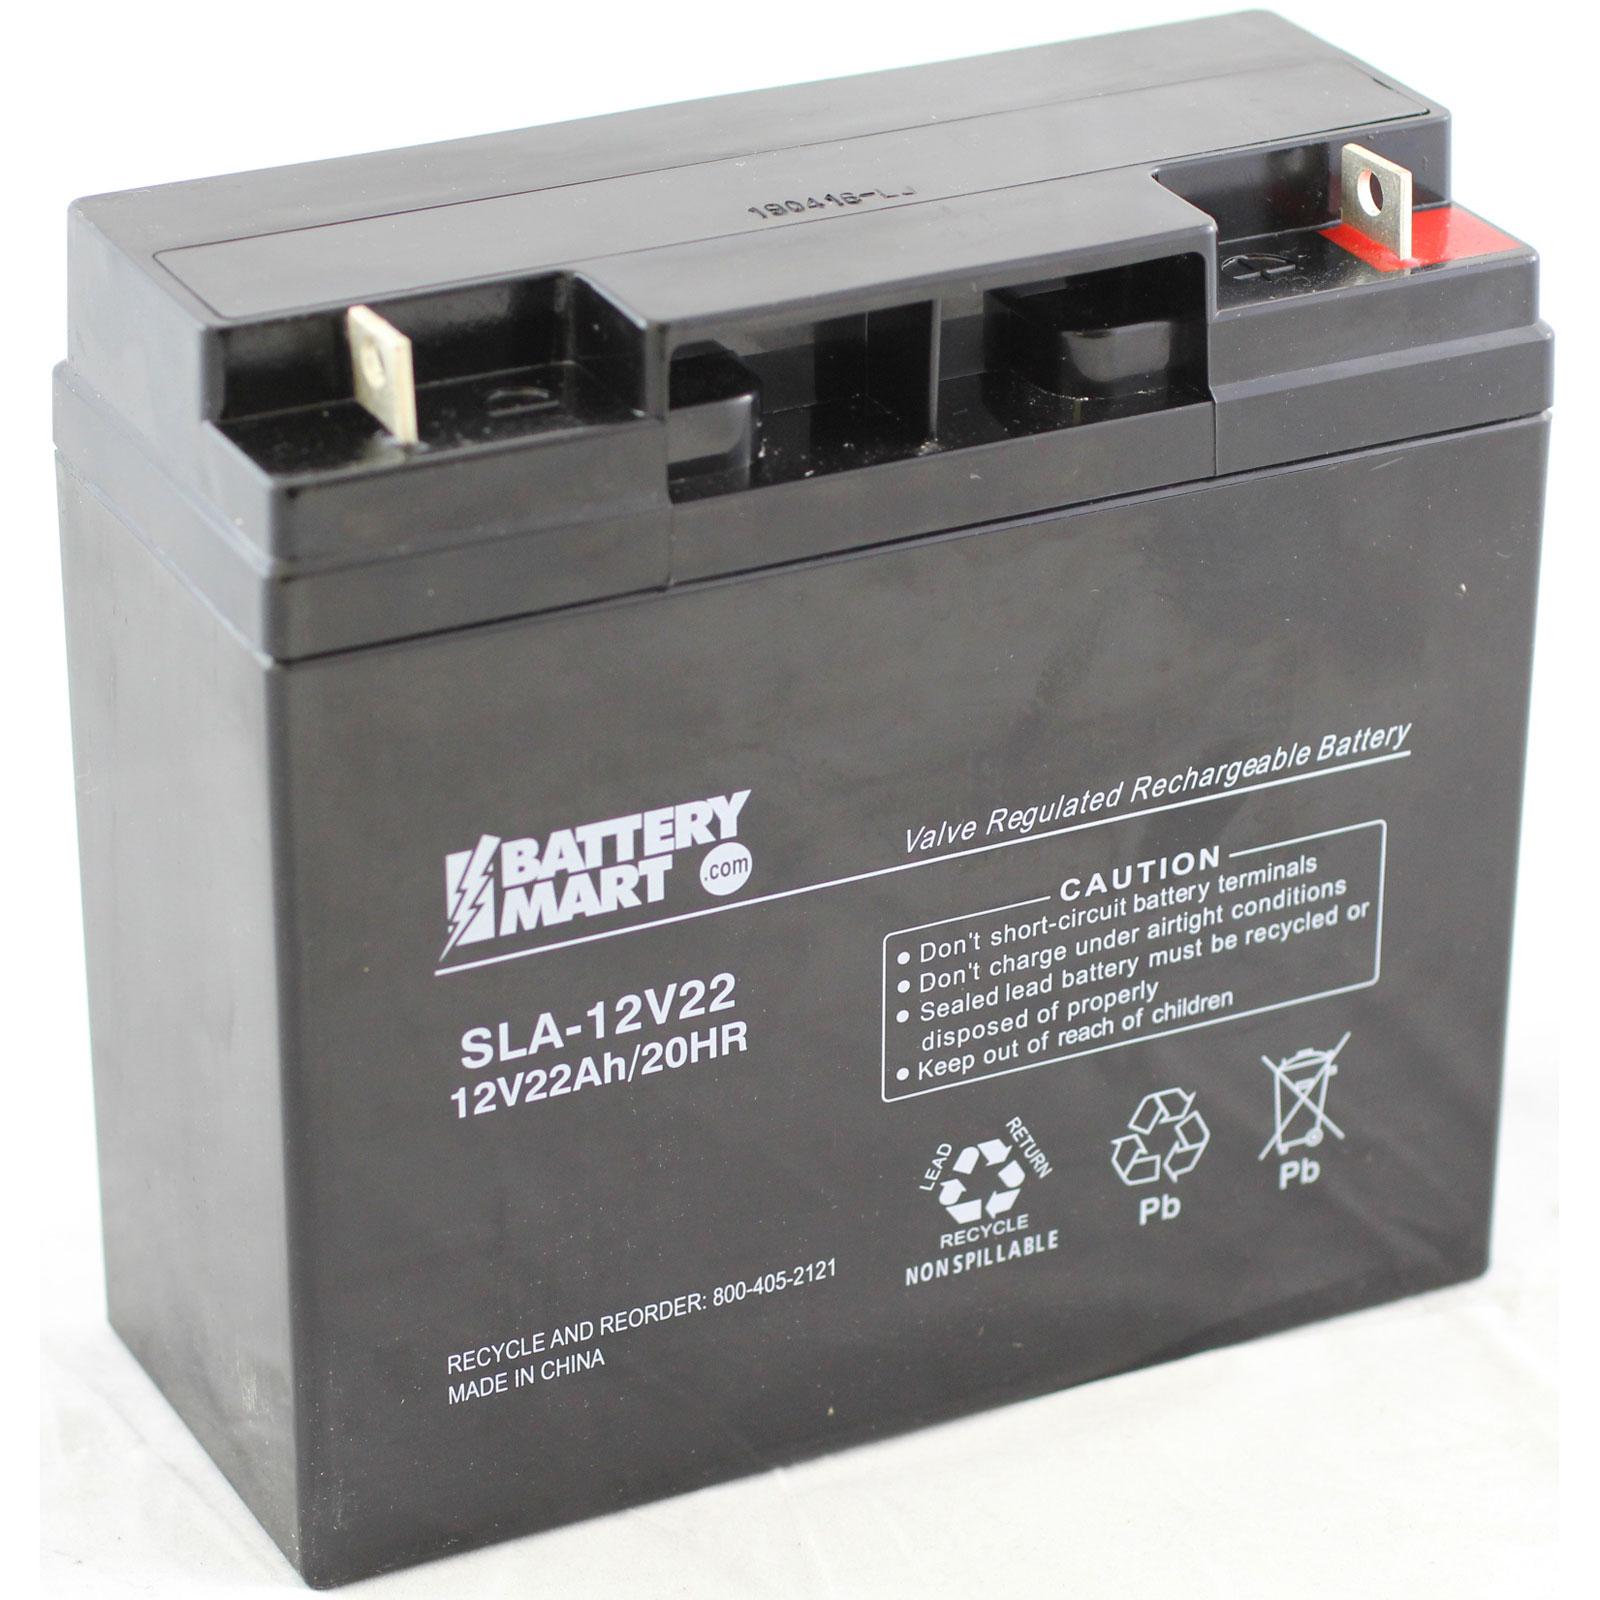 12 Volt 22 Ah Sealed Lead Acid Rechargeable Battery